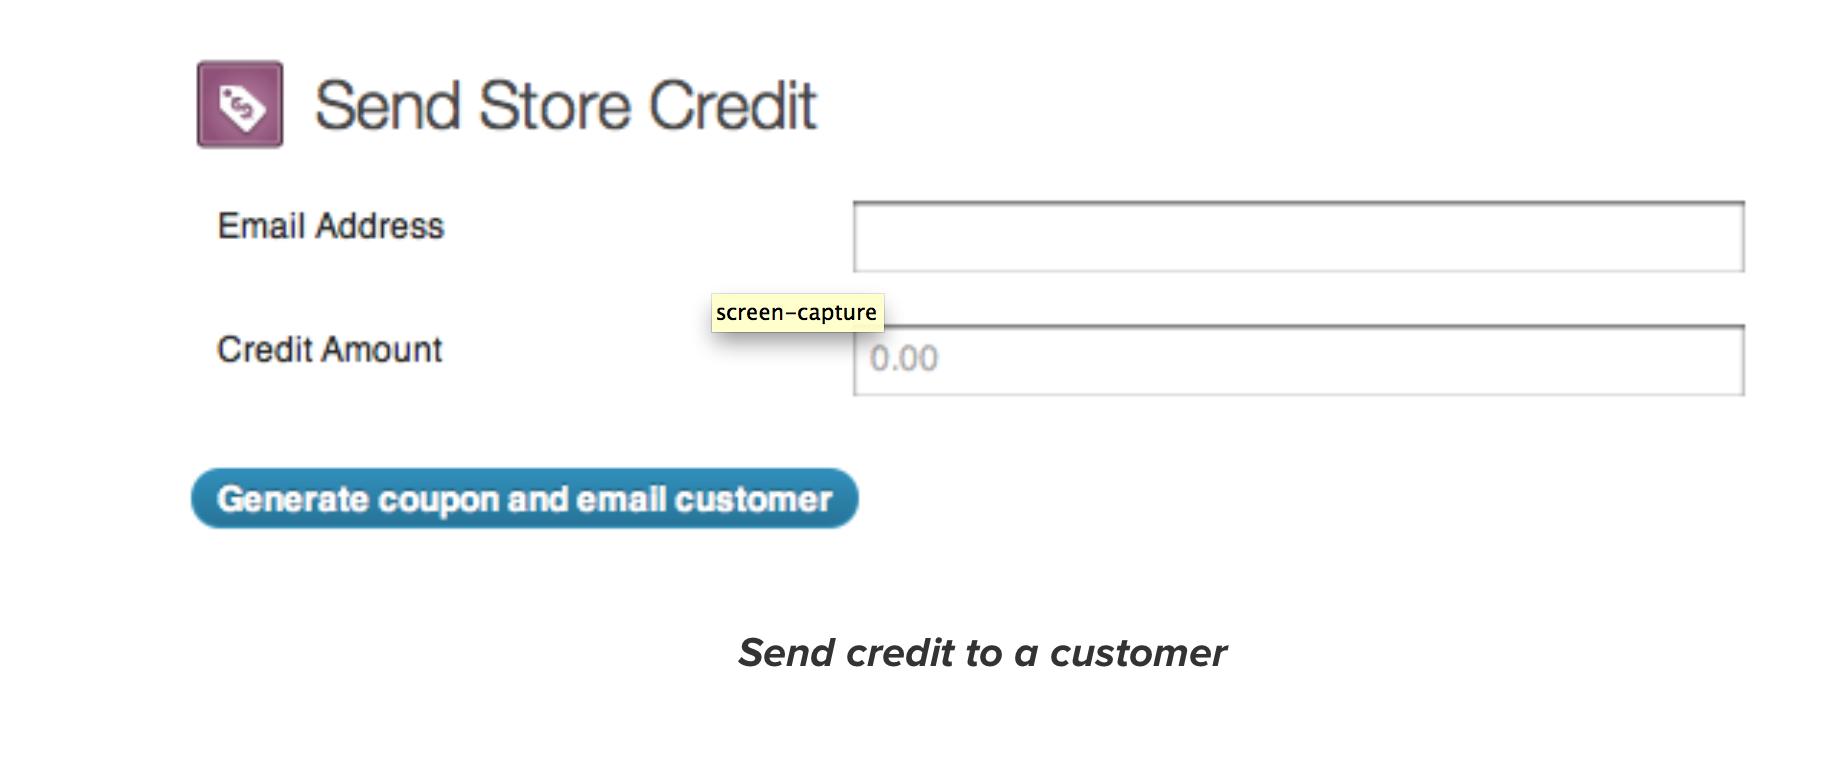 WooCommerce Store Credit Send Store Credit